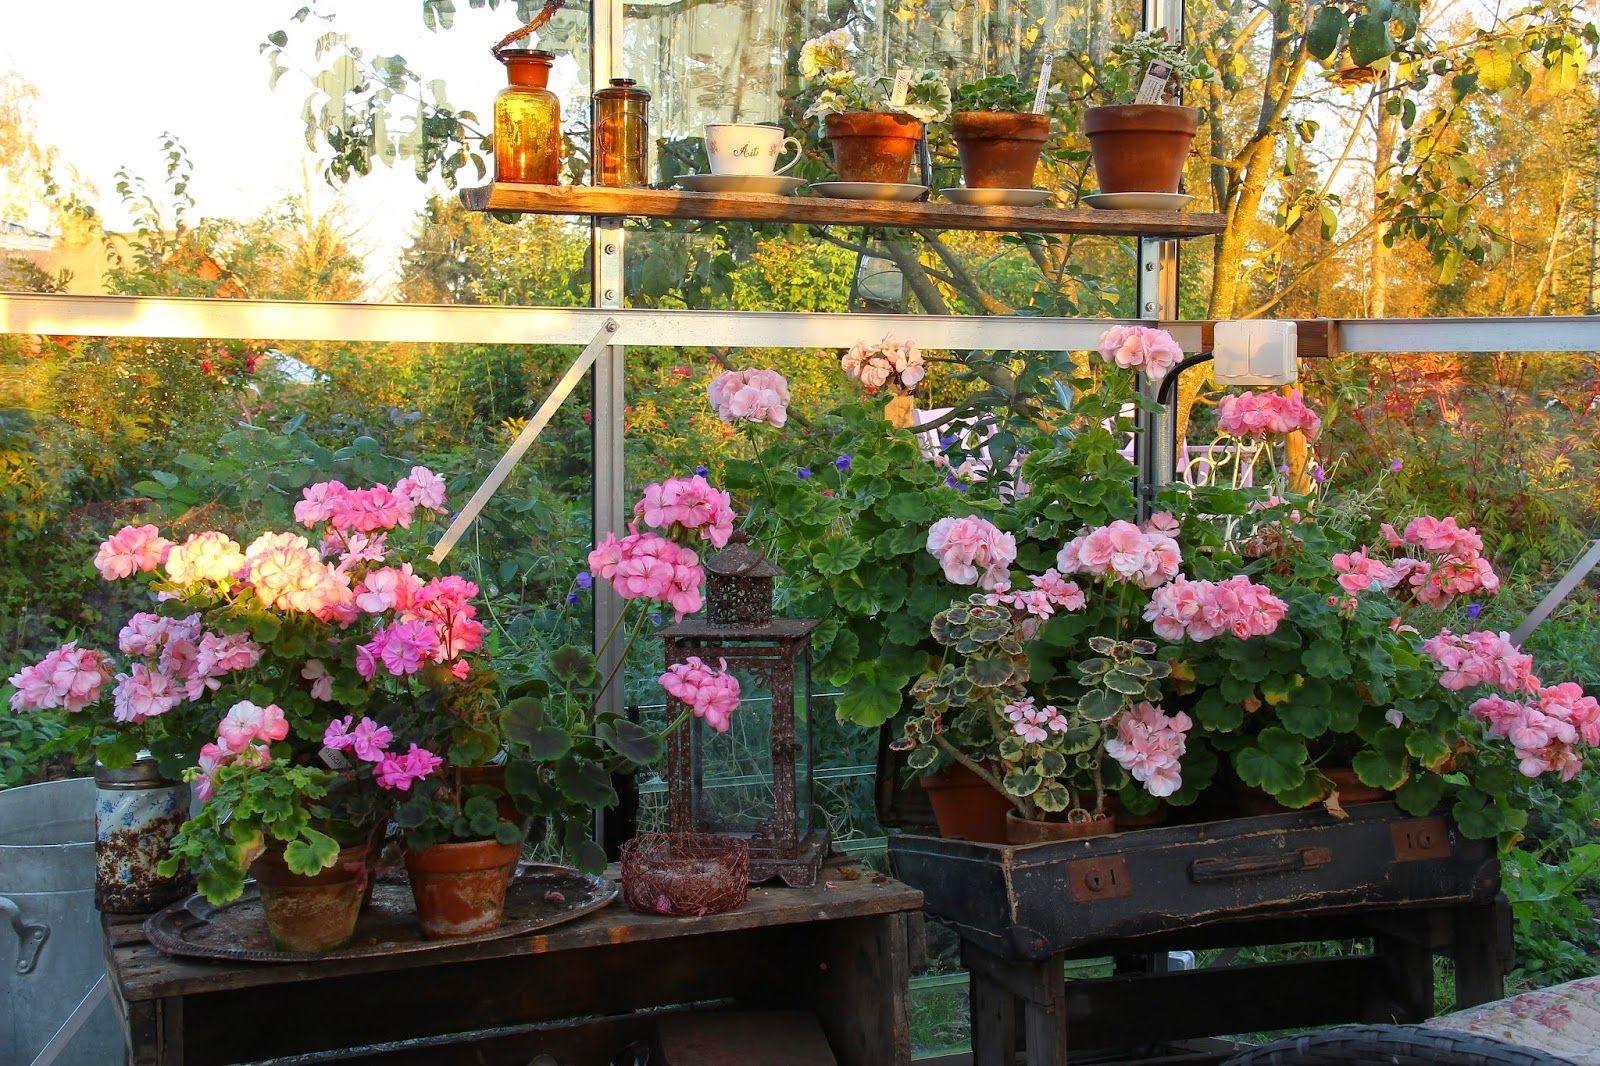 Ruusunmekko garden's greenhouse 'Lataamo' in September 2014 ... on pretty wildlife, pretty barn, pretty water, pretty spring, pretty lawn, pretty green, pretty forest, pretty roses, pretty porch, pretty house, pretty church, pretty shed,